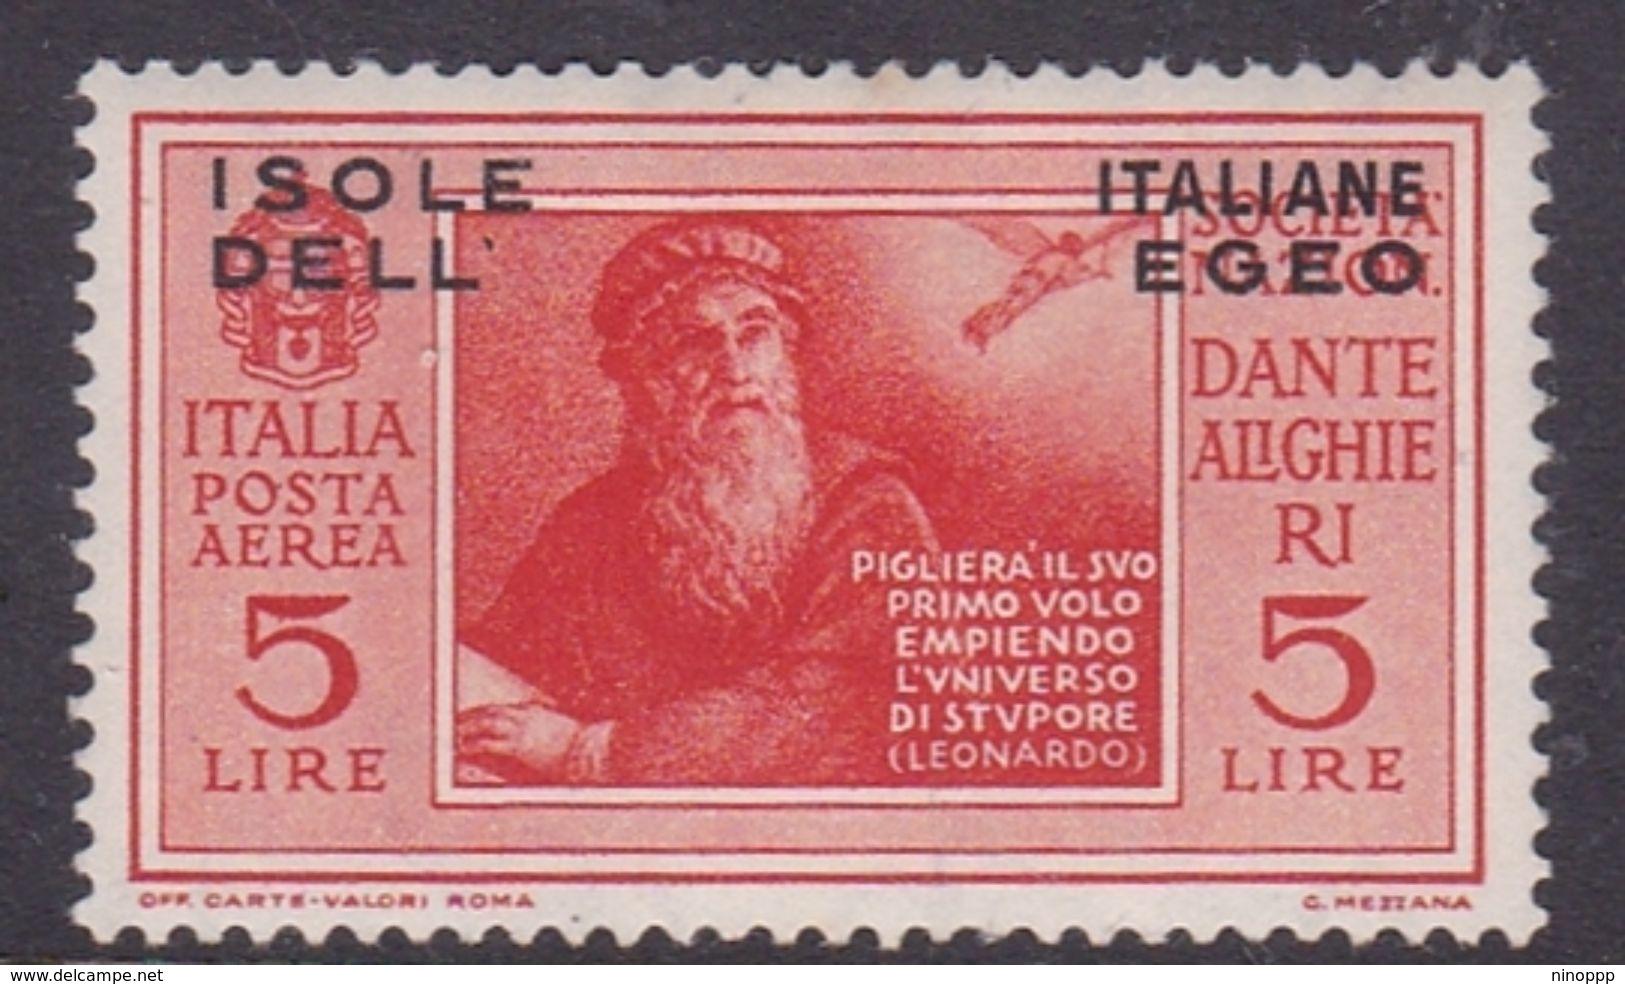 Italy-Colonies And Territories-Aegean General Issue-Rodi A11 1932 Air Mail Dante Alighieri 5 Lire Orange MH - Italy